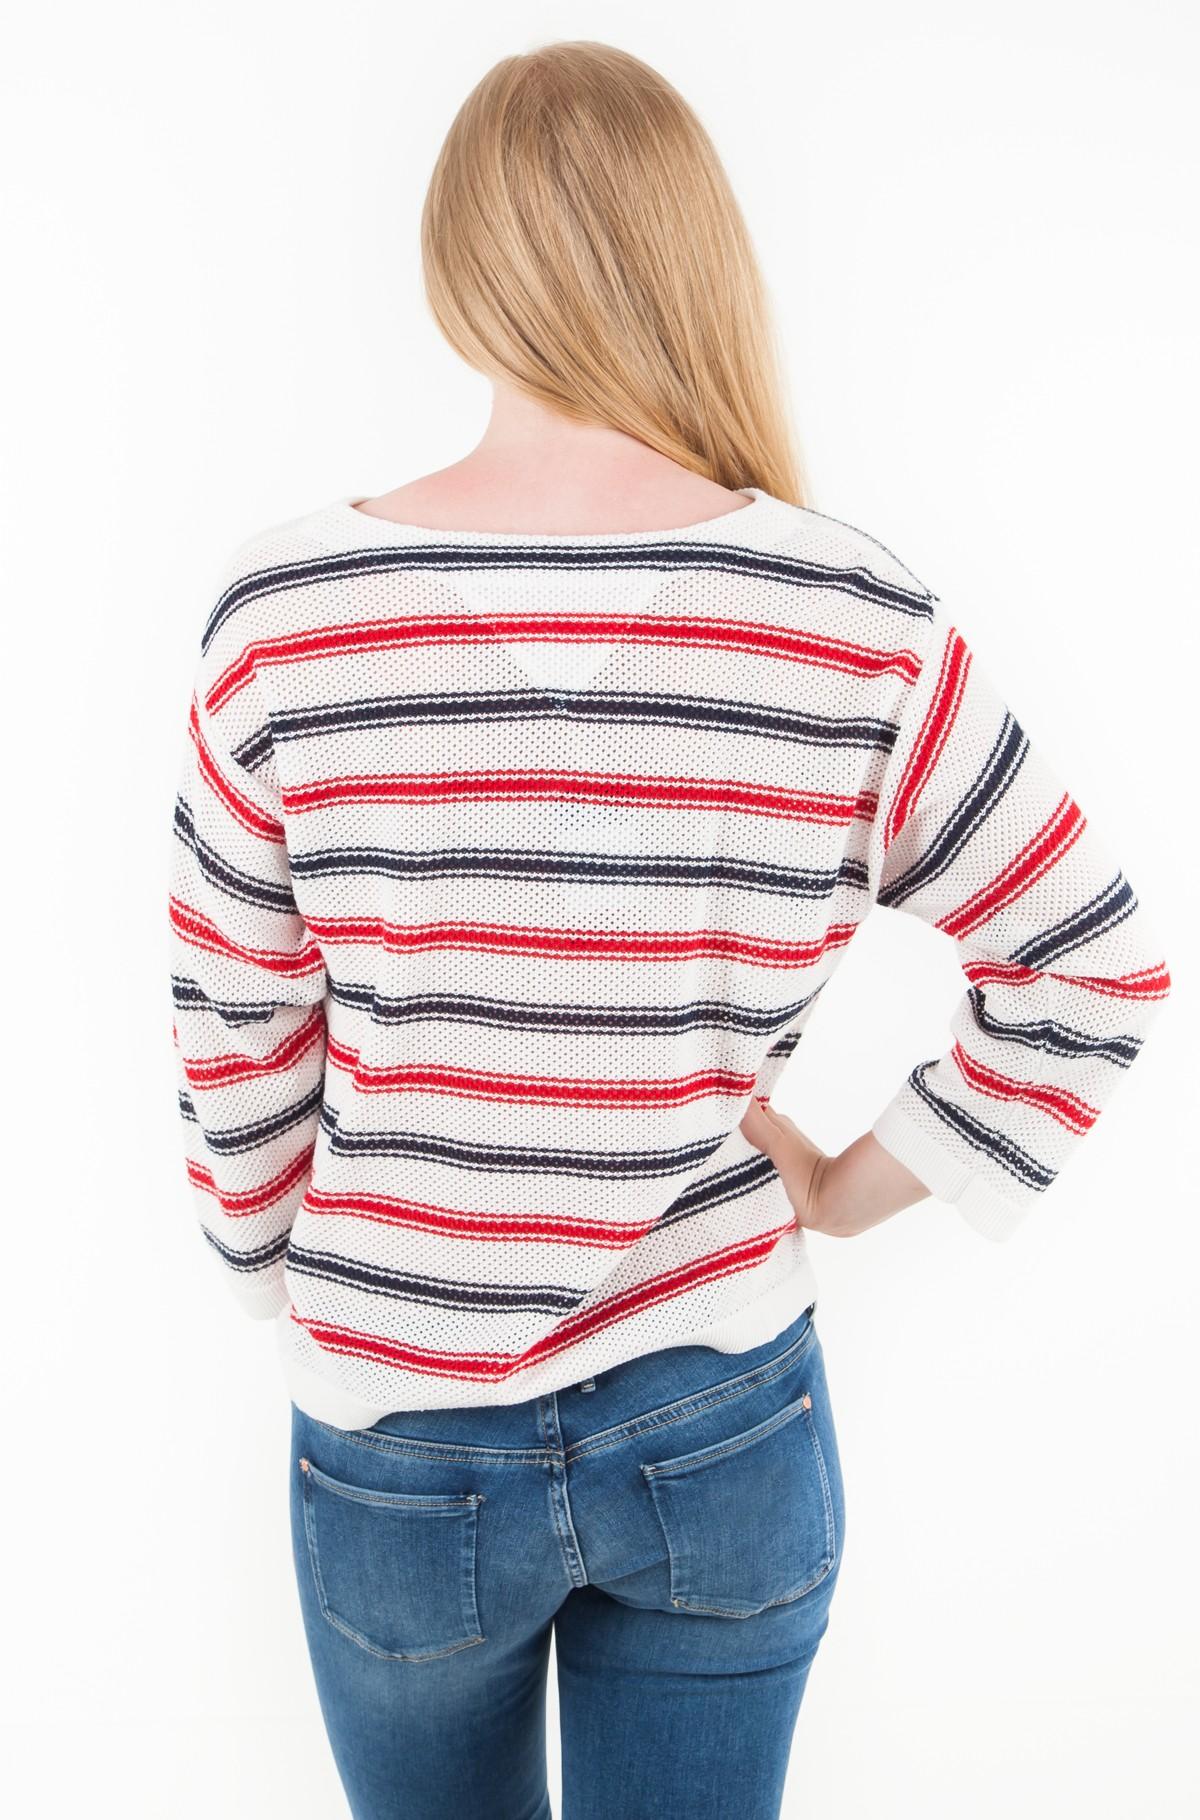 Sweater TJW MULTICOLOR STRIPE SWEATER-full-2